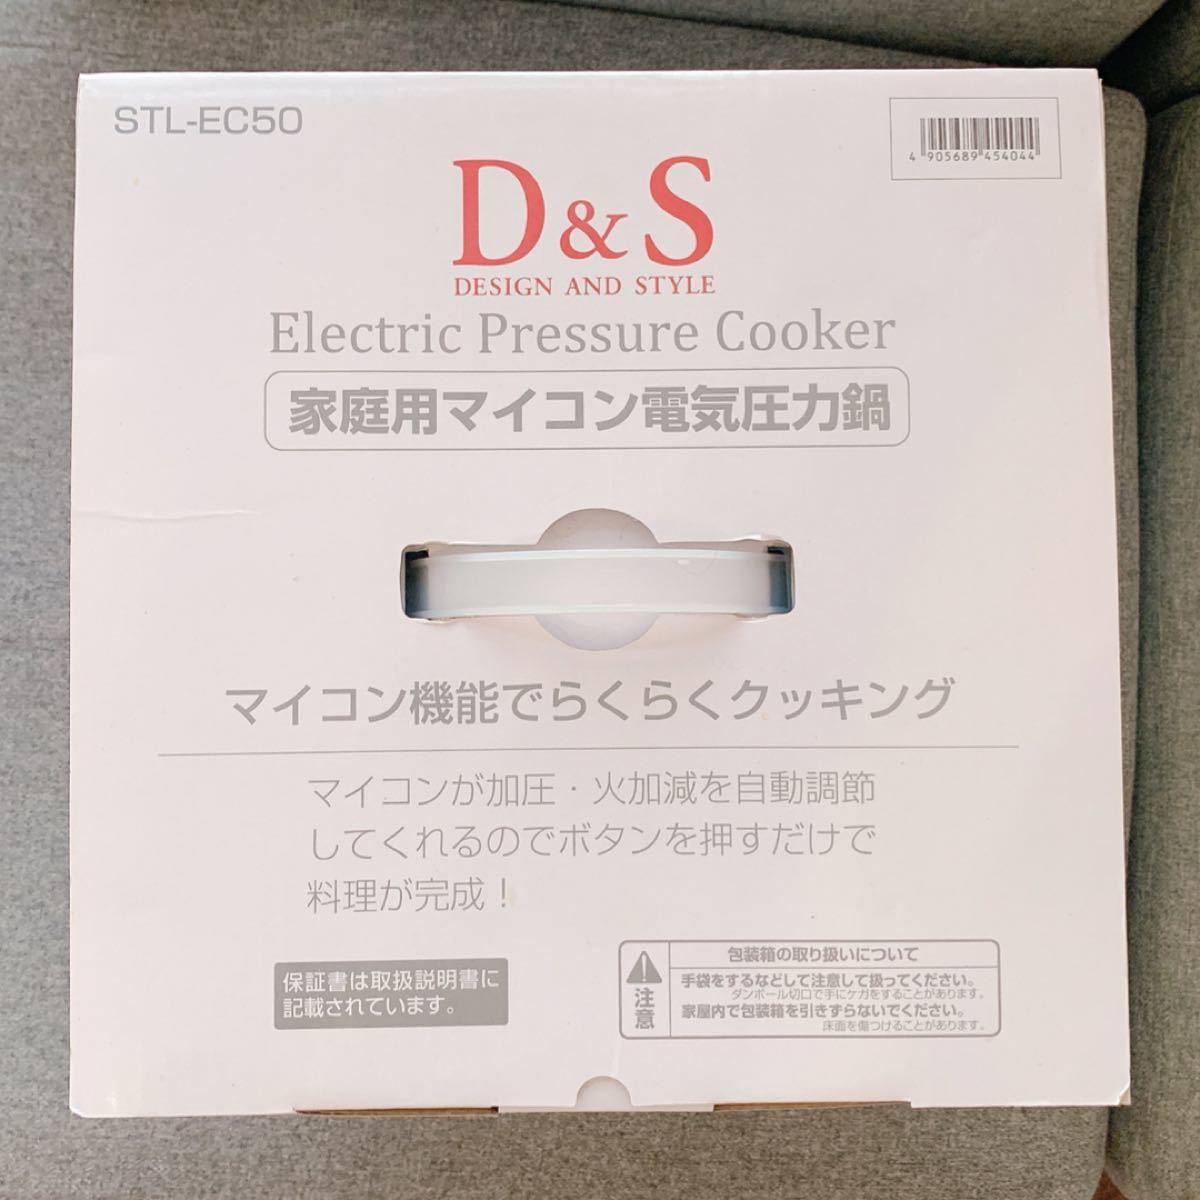 【新品・未開封】D&S 家庭用マイコン電気圧力鍋 4L